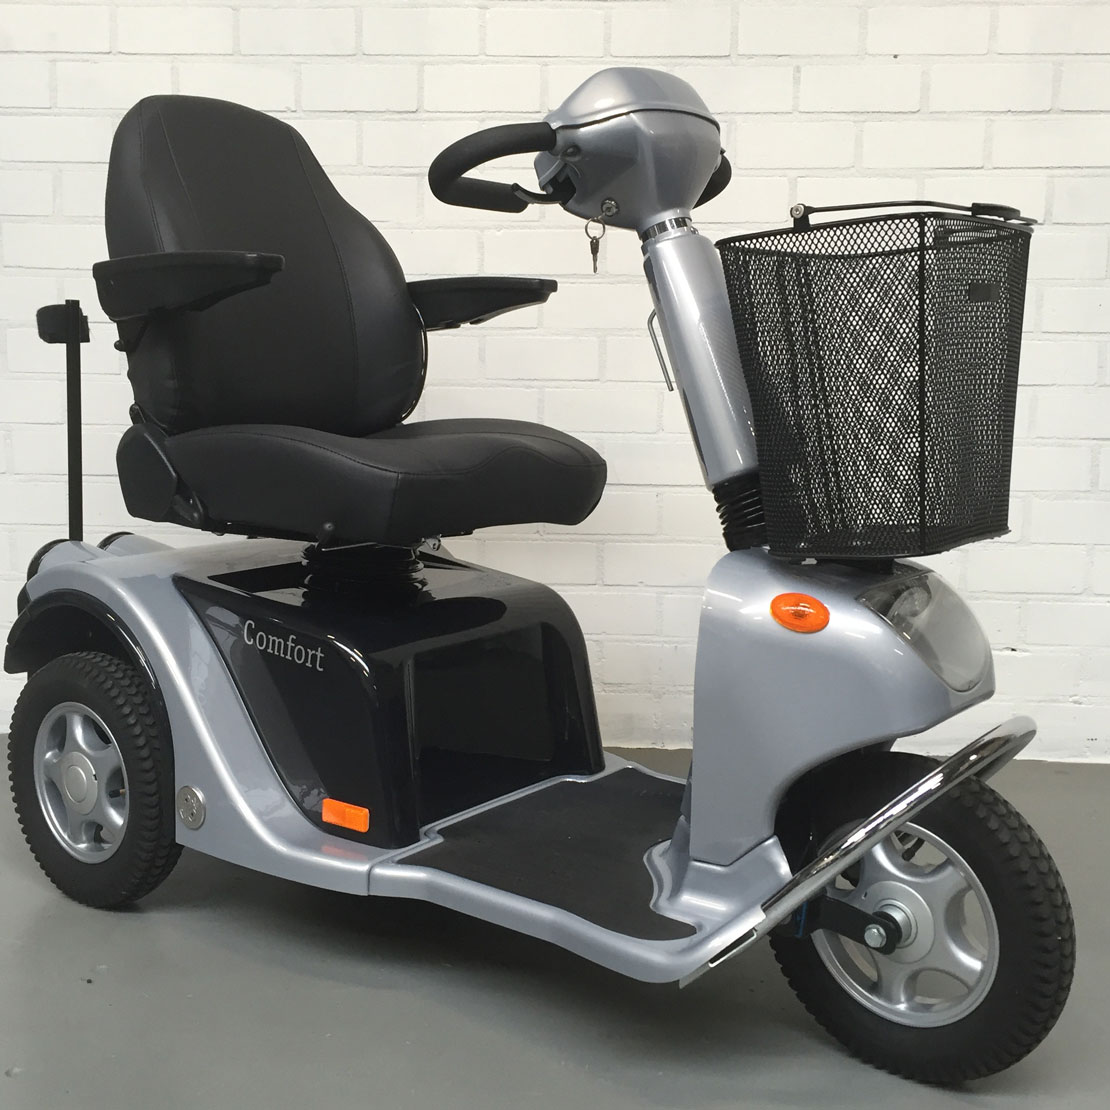 Revatak-TS120-Comfort-scootmobiel-